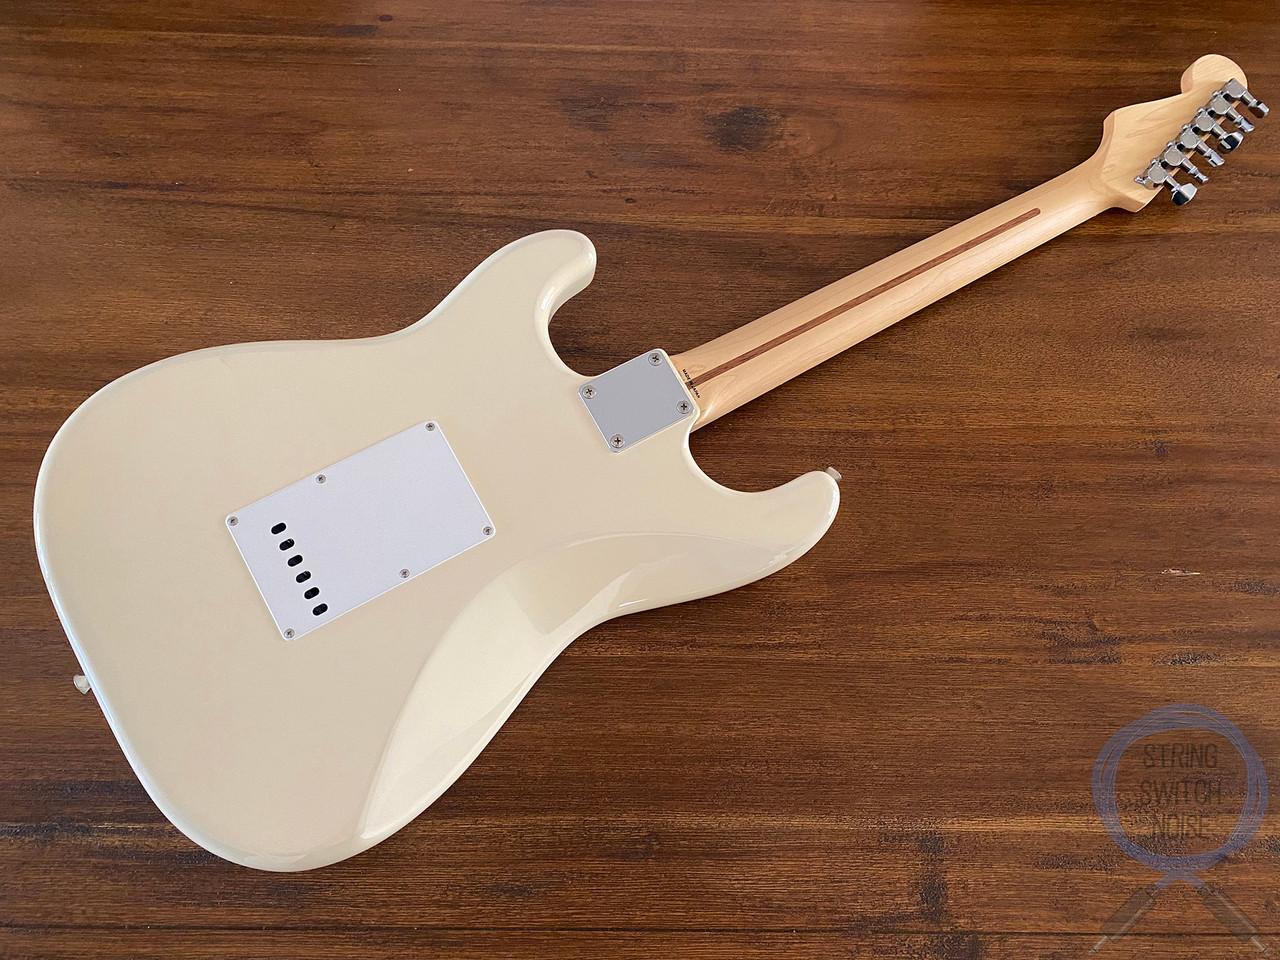 Fender Stratocaster, Vintage White, 2011, Excellent Condition